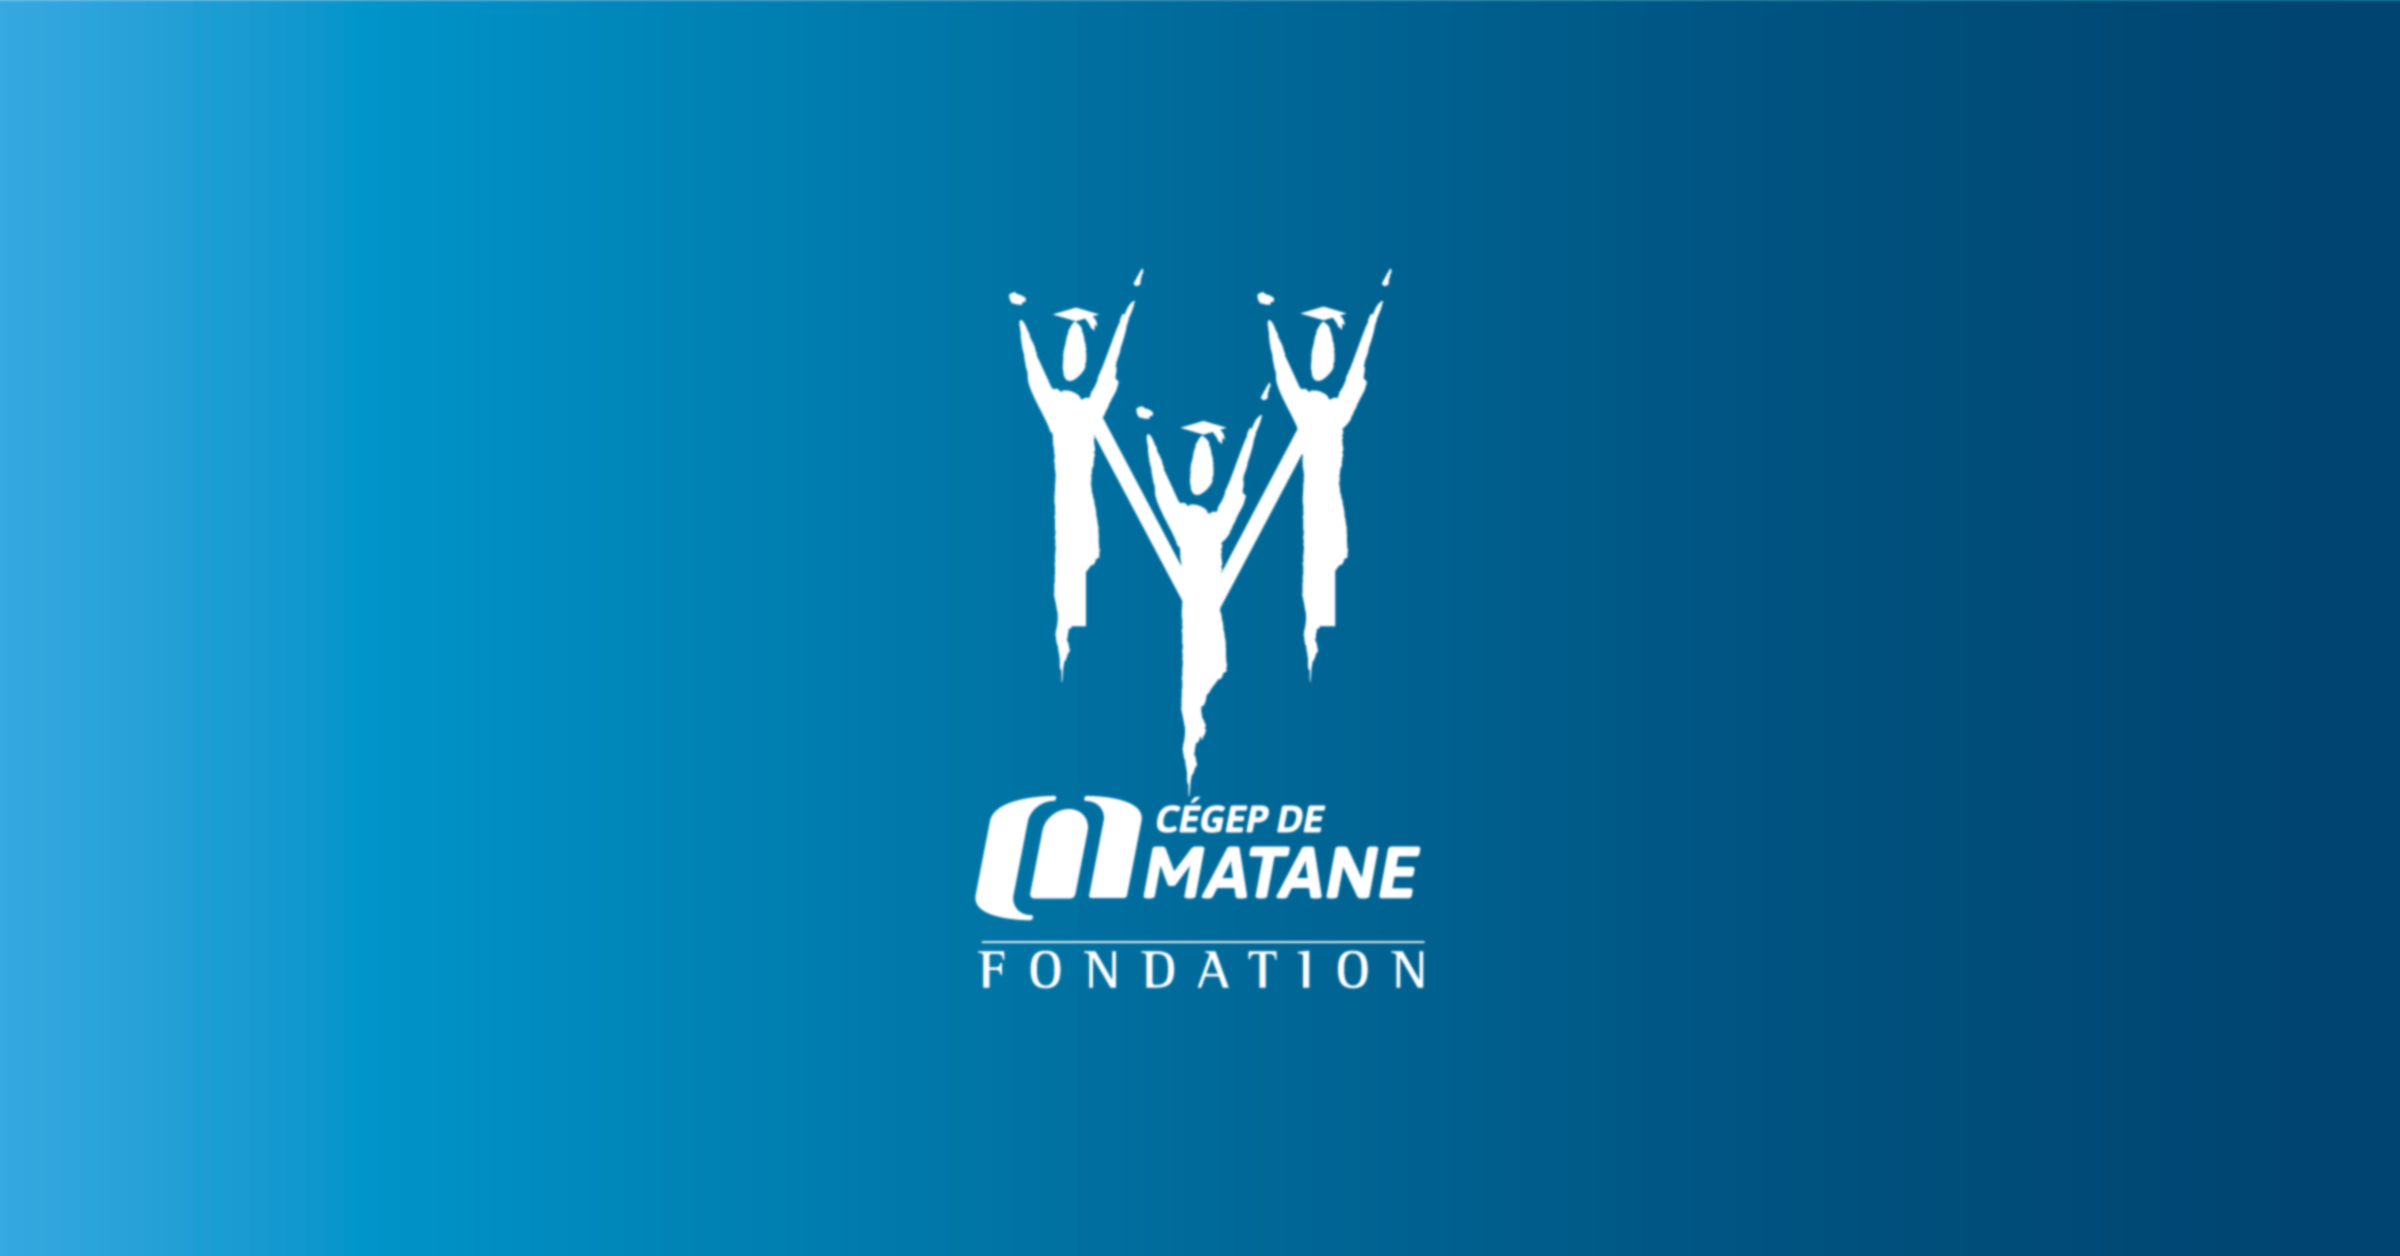 visuel fondation Cégep de Matane